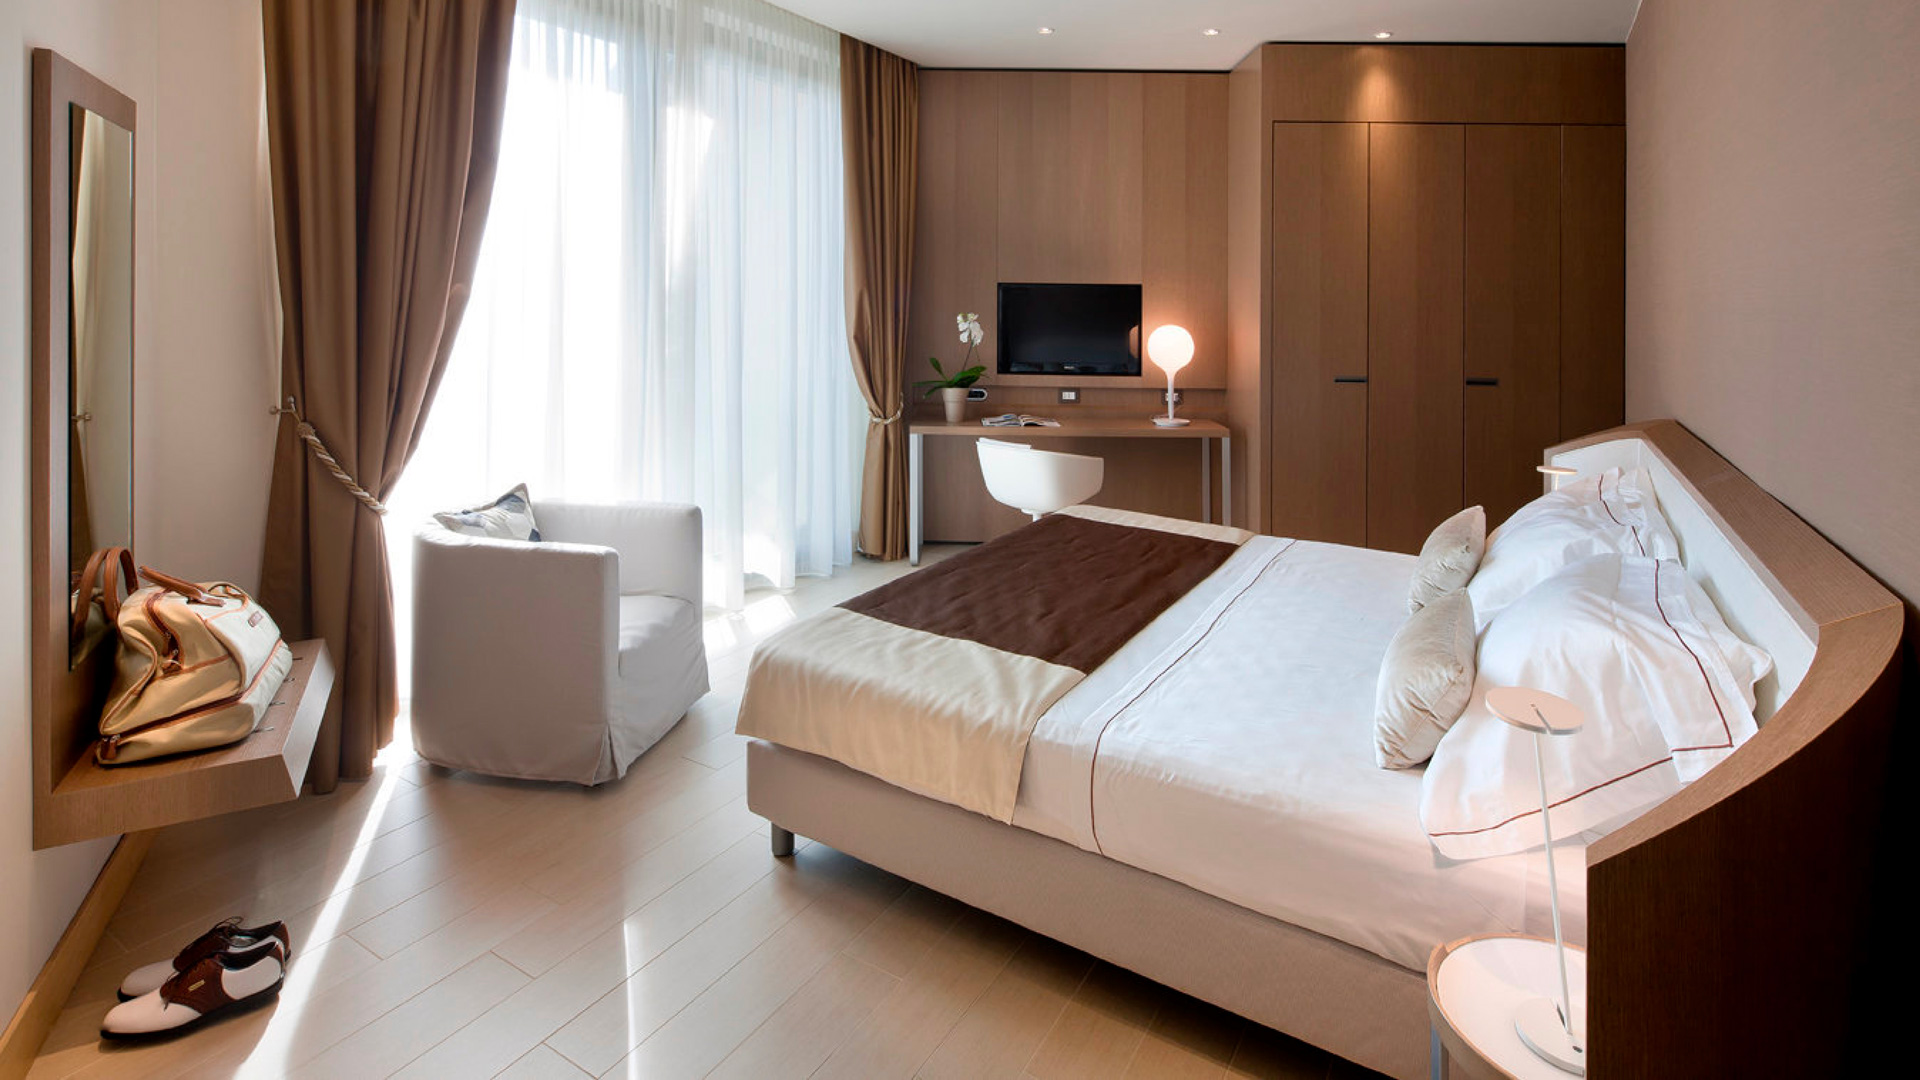 Poliform_contract_hospitality_CLUB_HOUSE_ALBARELLA_05_1920x1080px_gallery